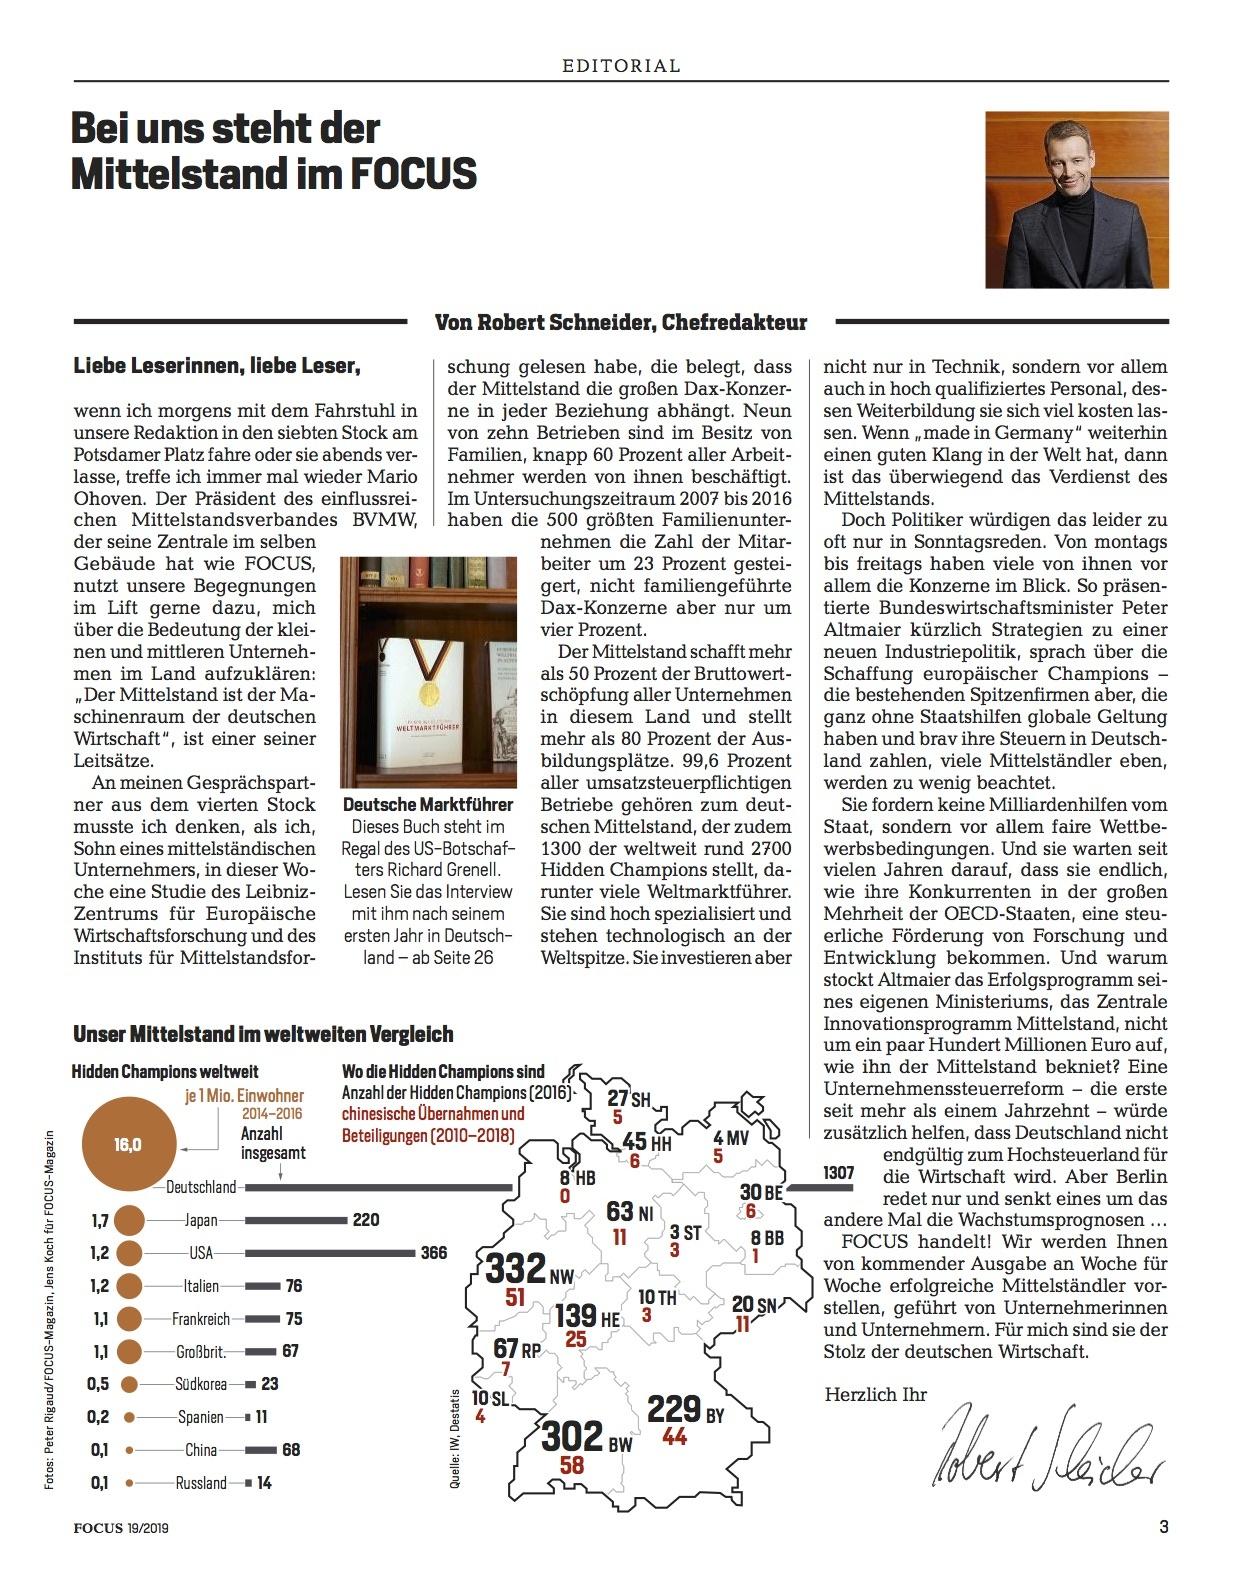 FOCUS Magazin FOCUS Magazin - Die neue Lust am Essen